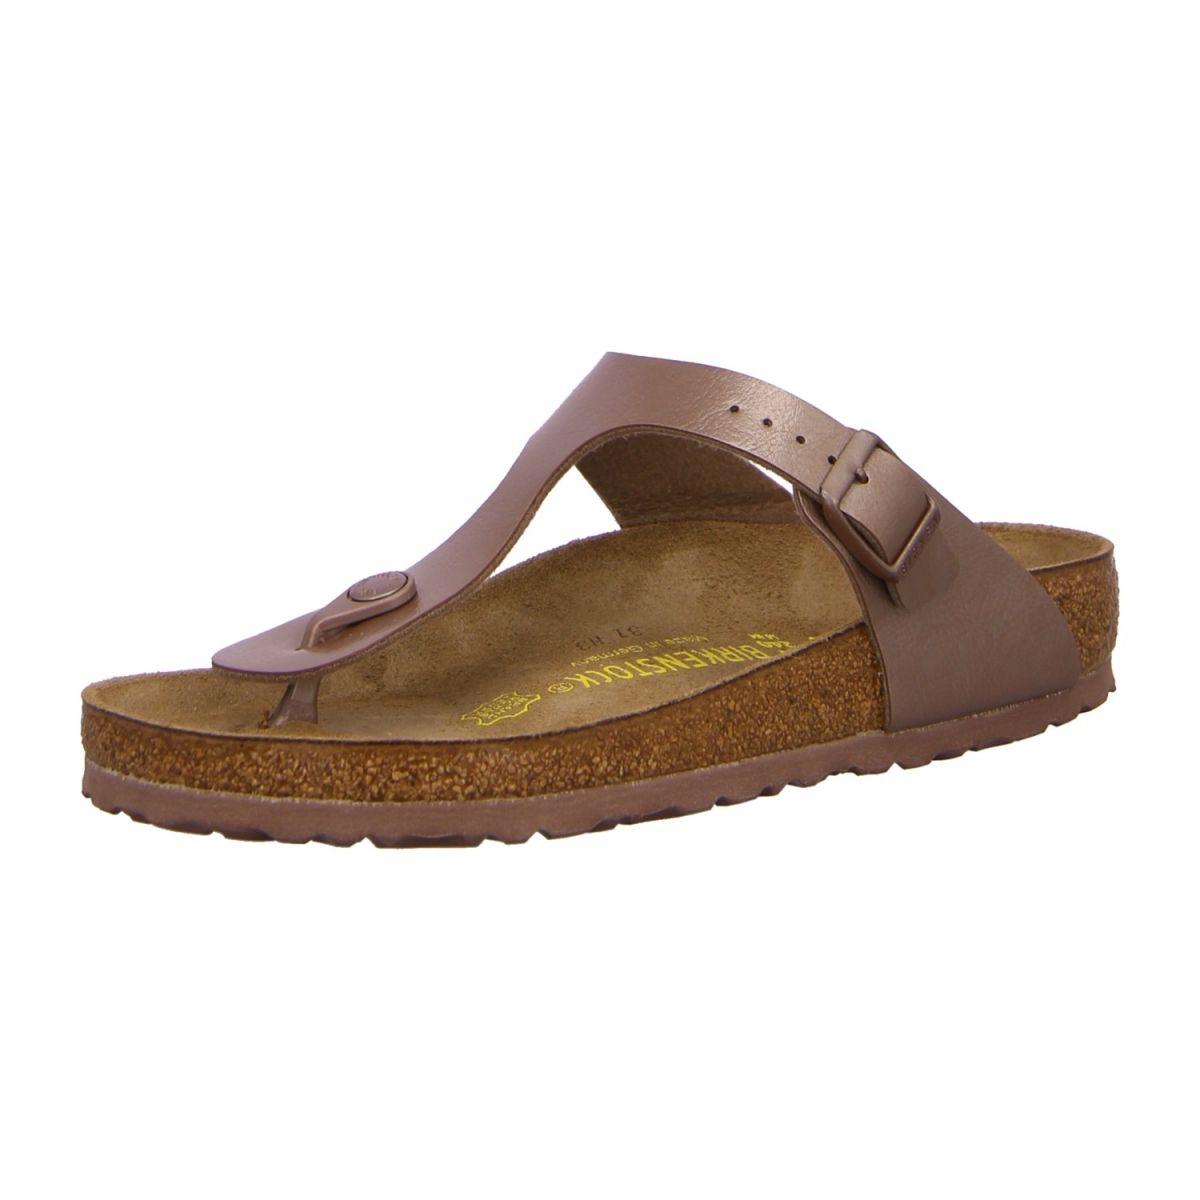 ayhJwjQKiw Gizeh Soft Metallic Silver, Schuhe, Sneaker & Sportschuhe, Flache Sneaker, Braun, Female, 35